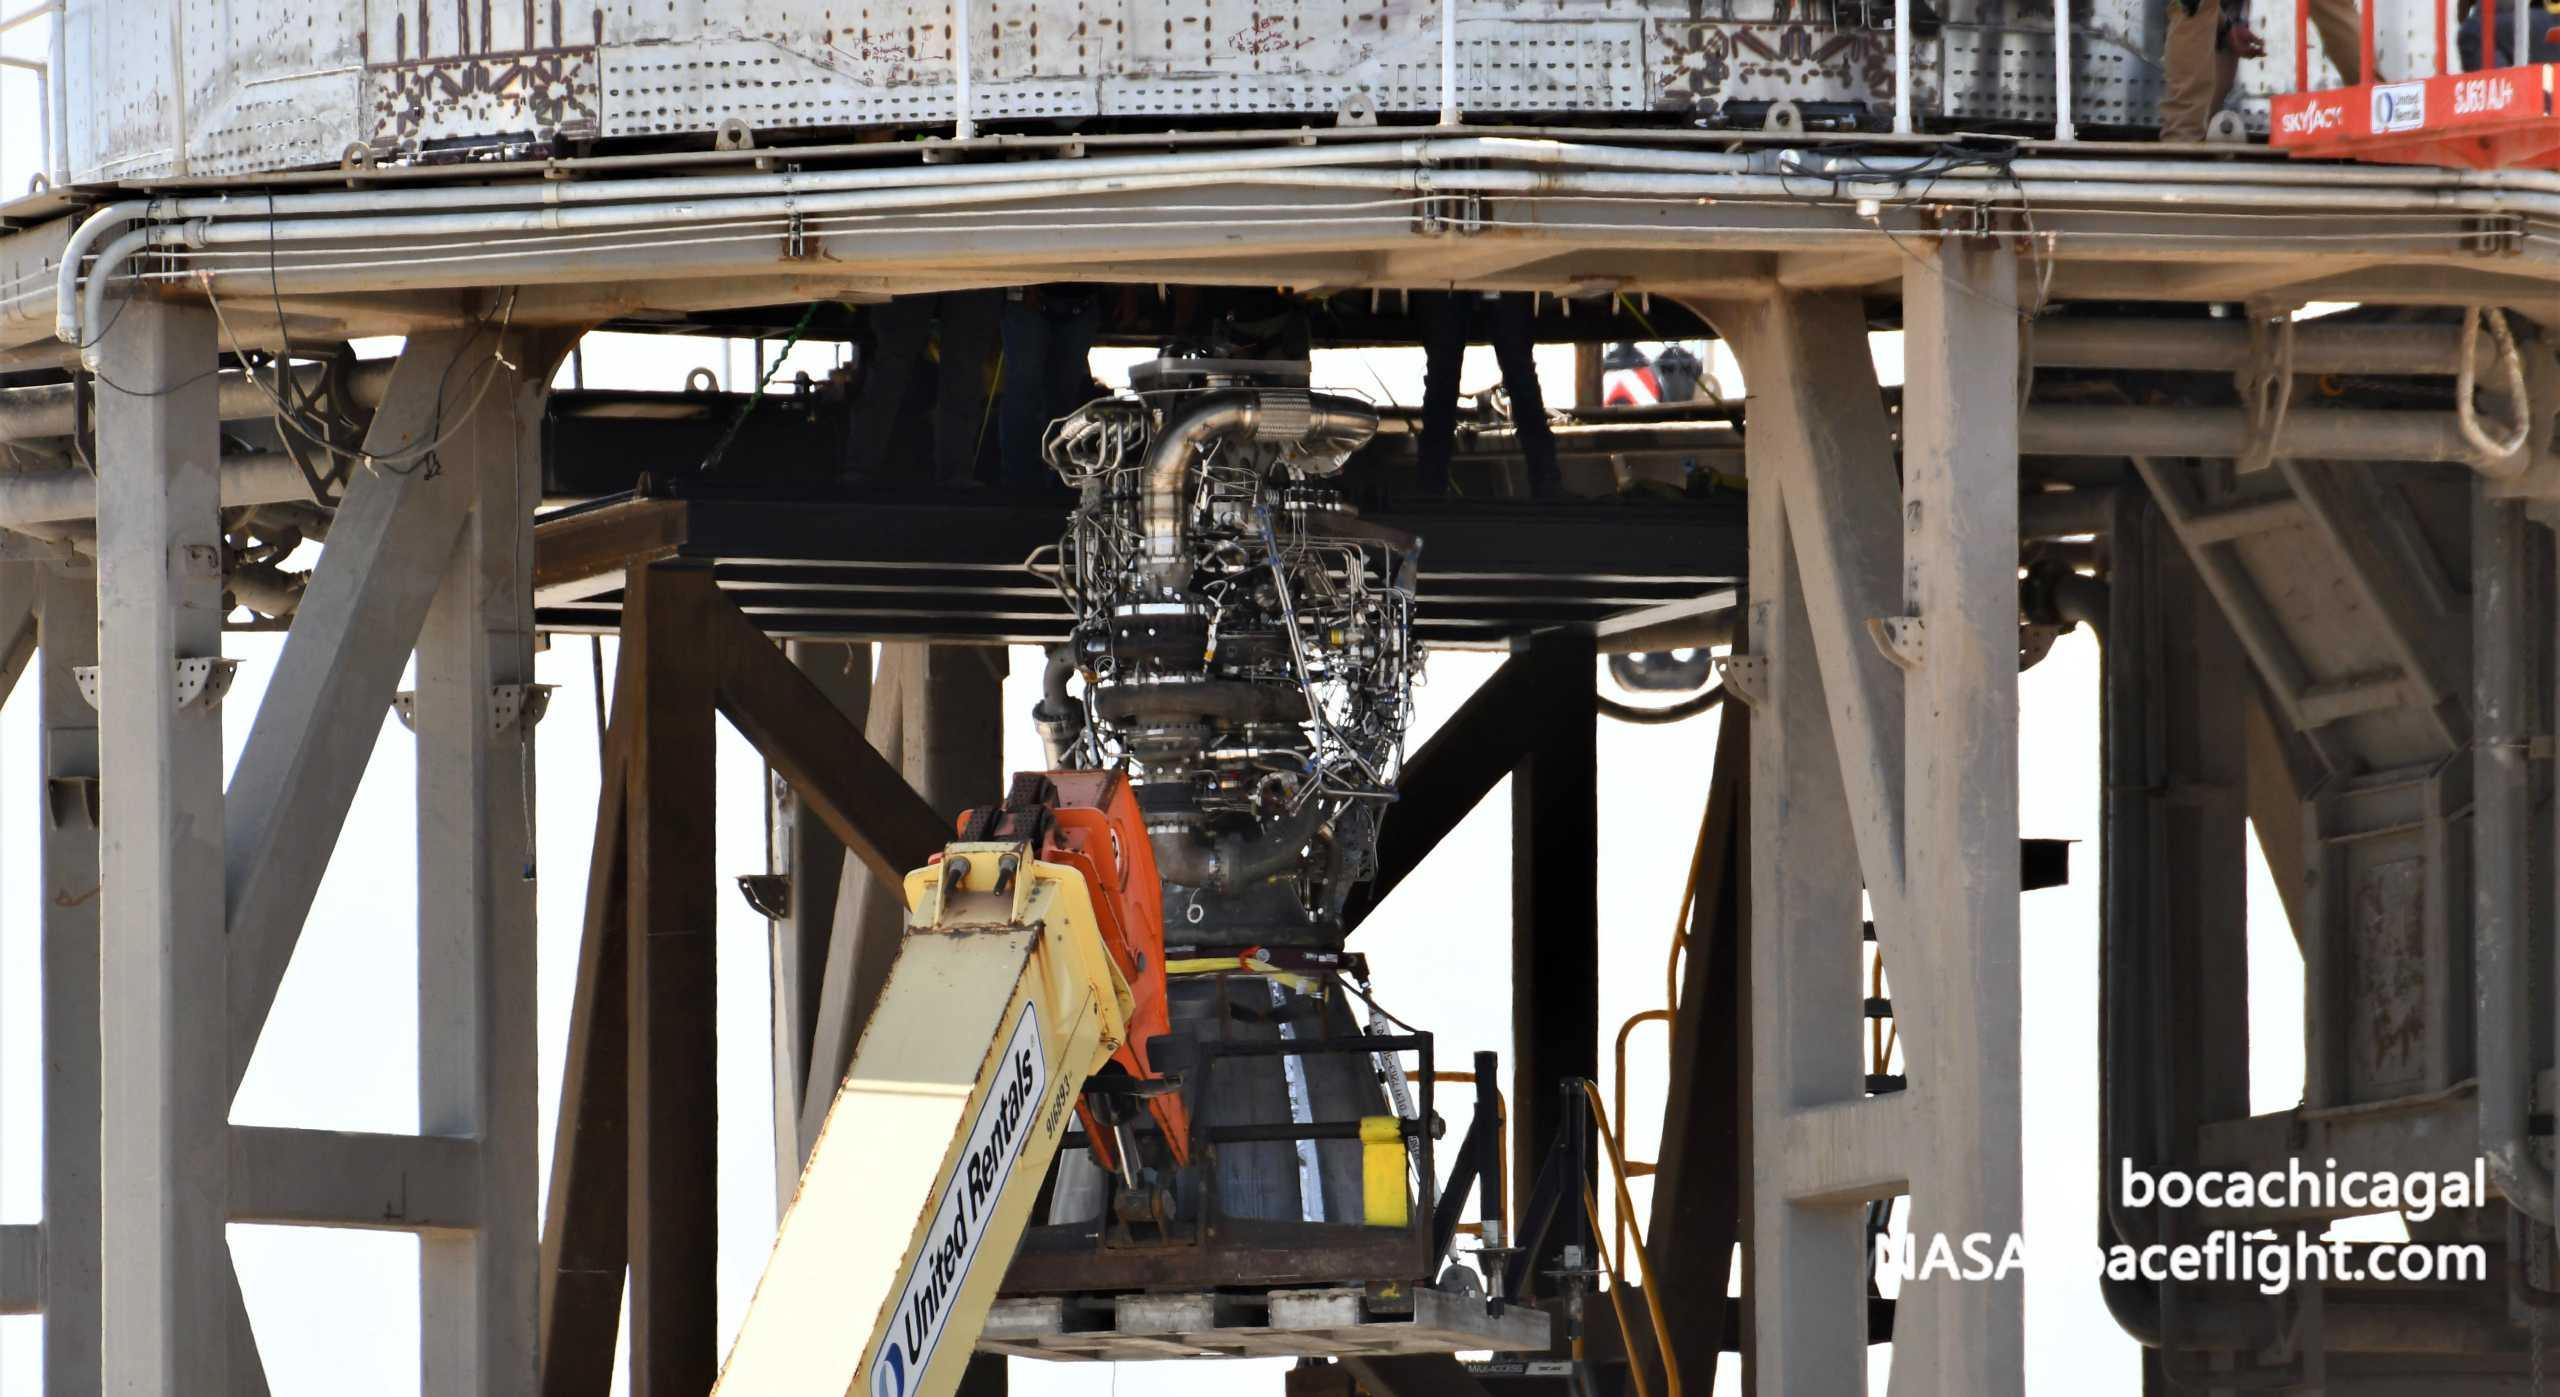 Starship Boca Chica 081820 (NASASpaceflight – bocachicagal) SN6 Raptor SN29 install 5 crop (c)